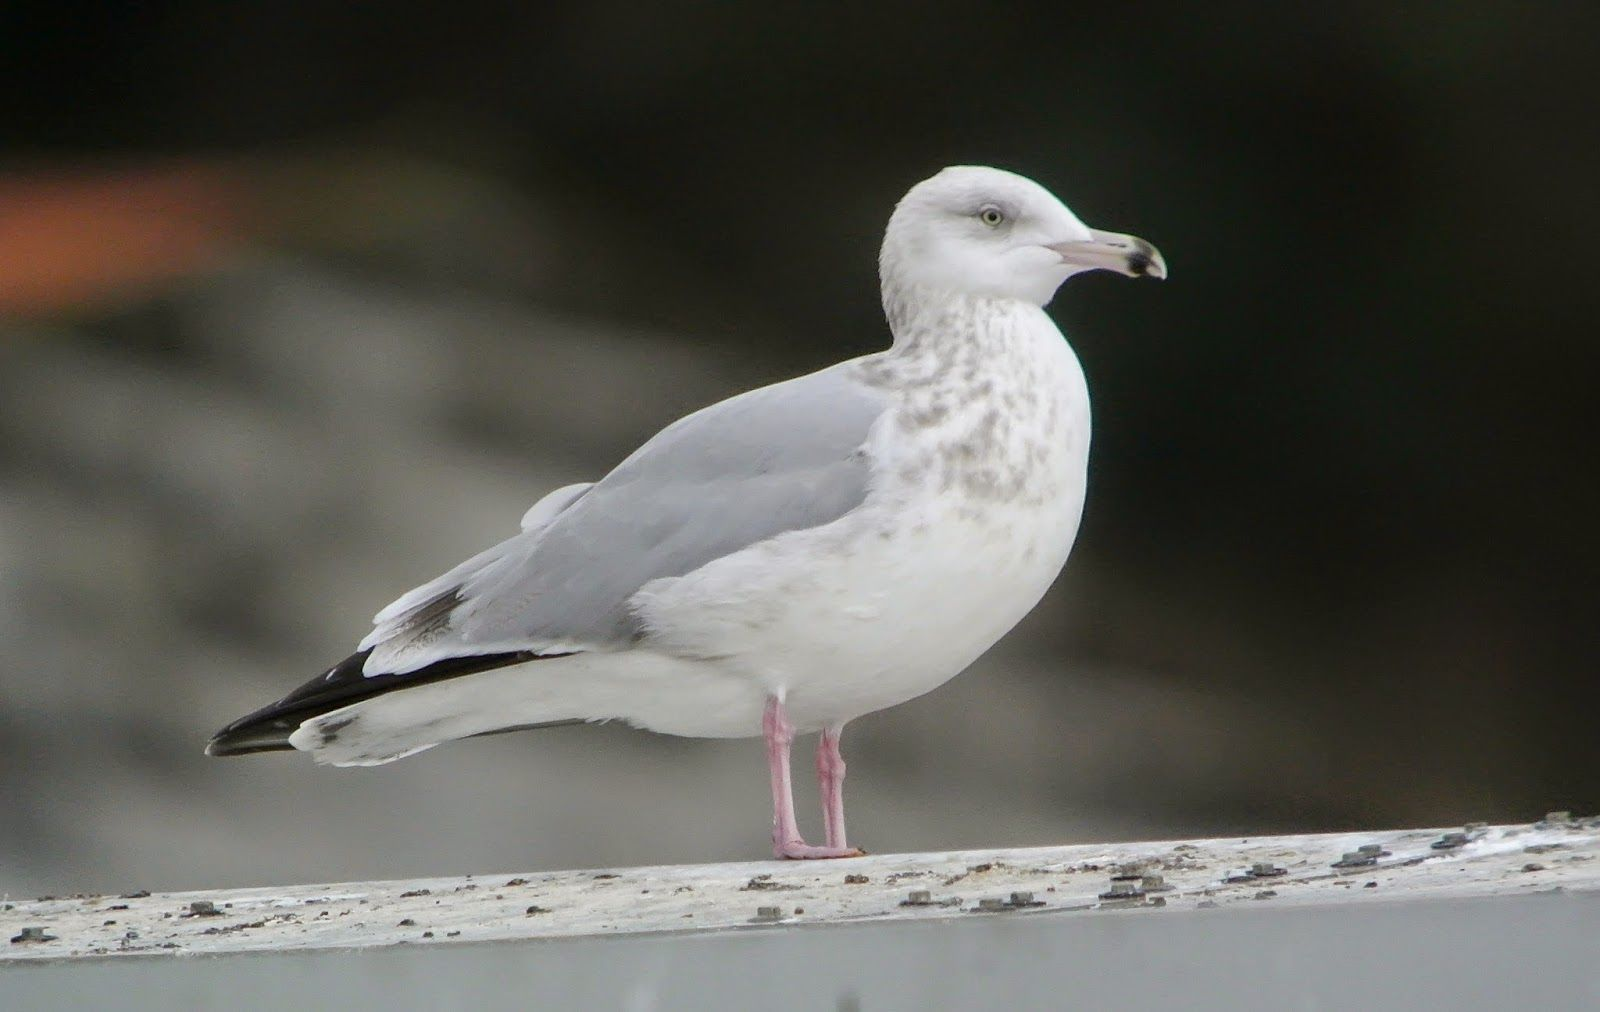 Gaviota Argentea Amaricanade 3 invierno, American Herring Gull 3 winter, Larus smithsonianus